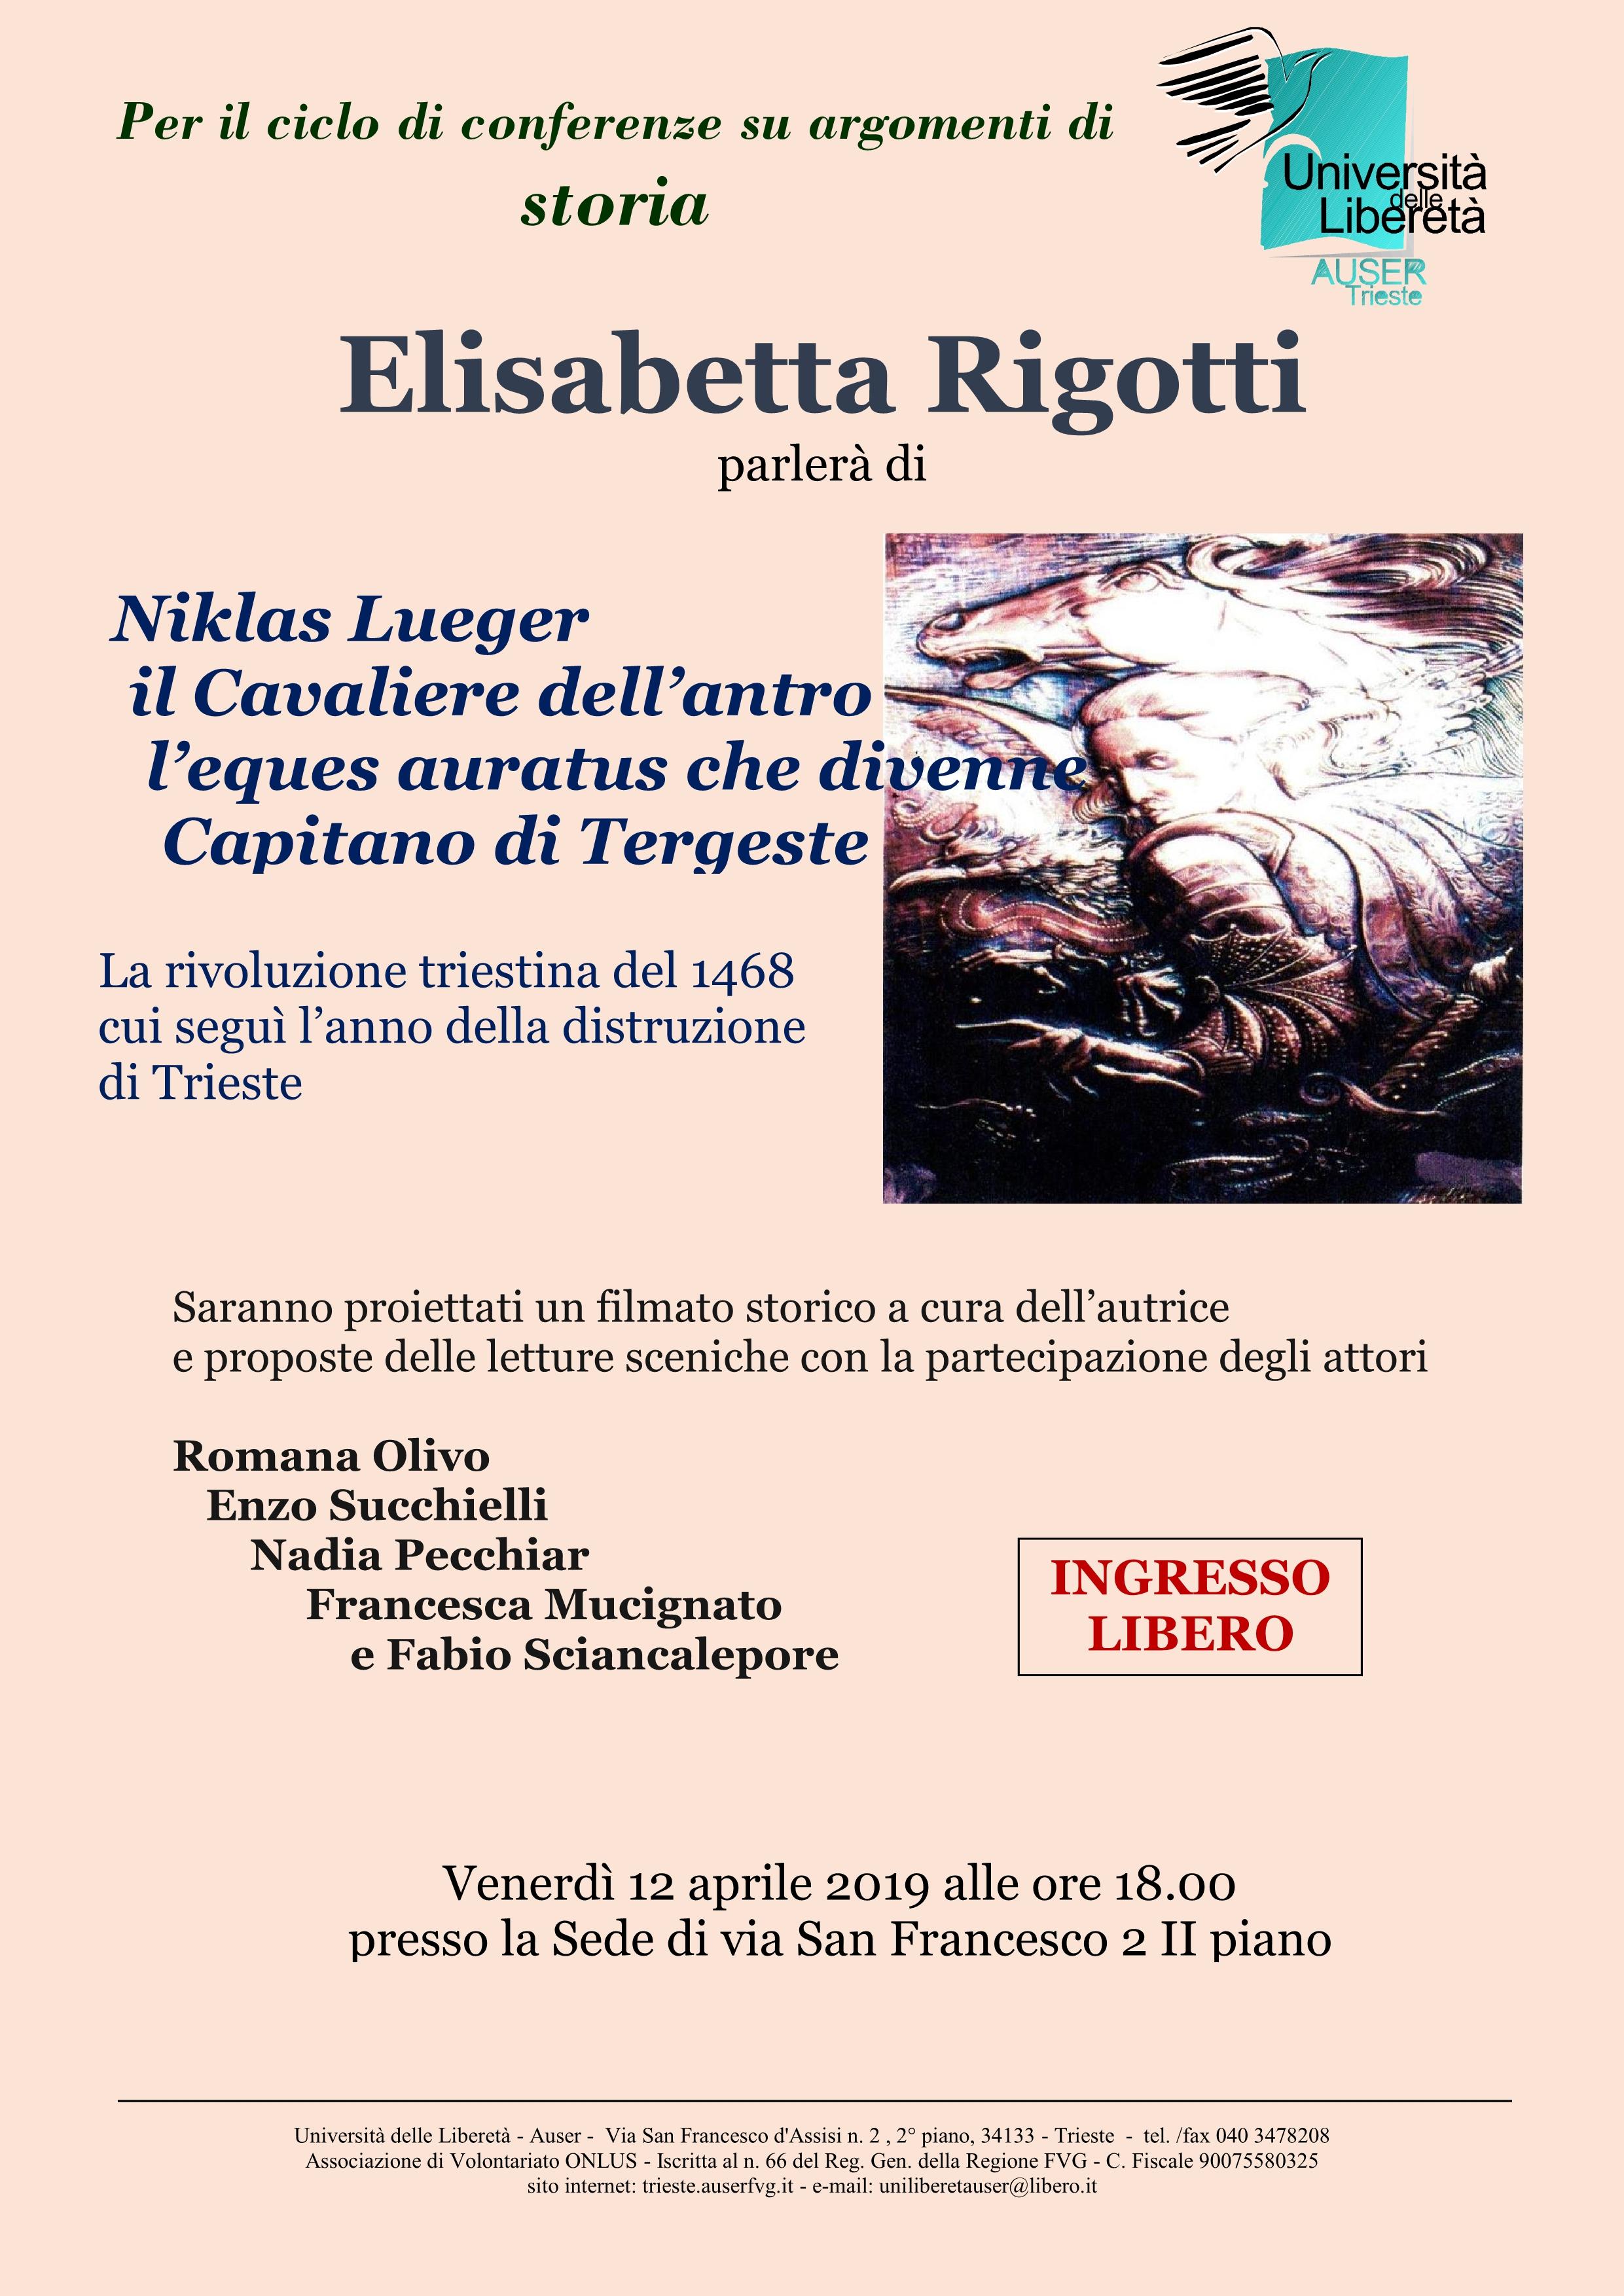 Elisabetta Rigotti1